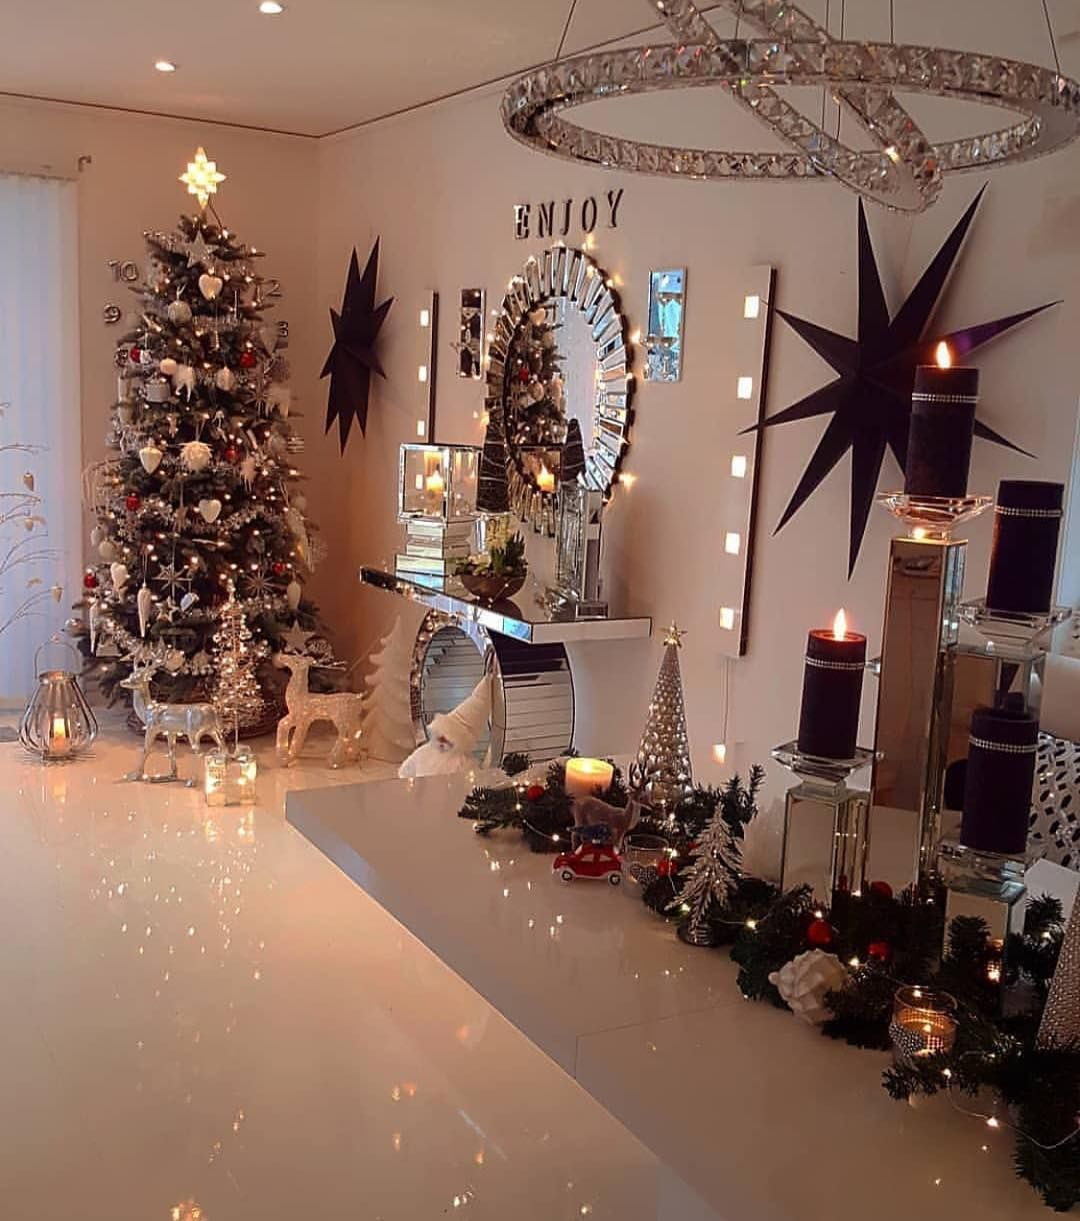 Wholesale Eyelash Extension Supplies Home Decor Shops Cool Christmas Trees Home Decor Store